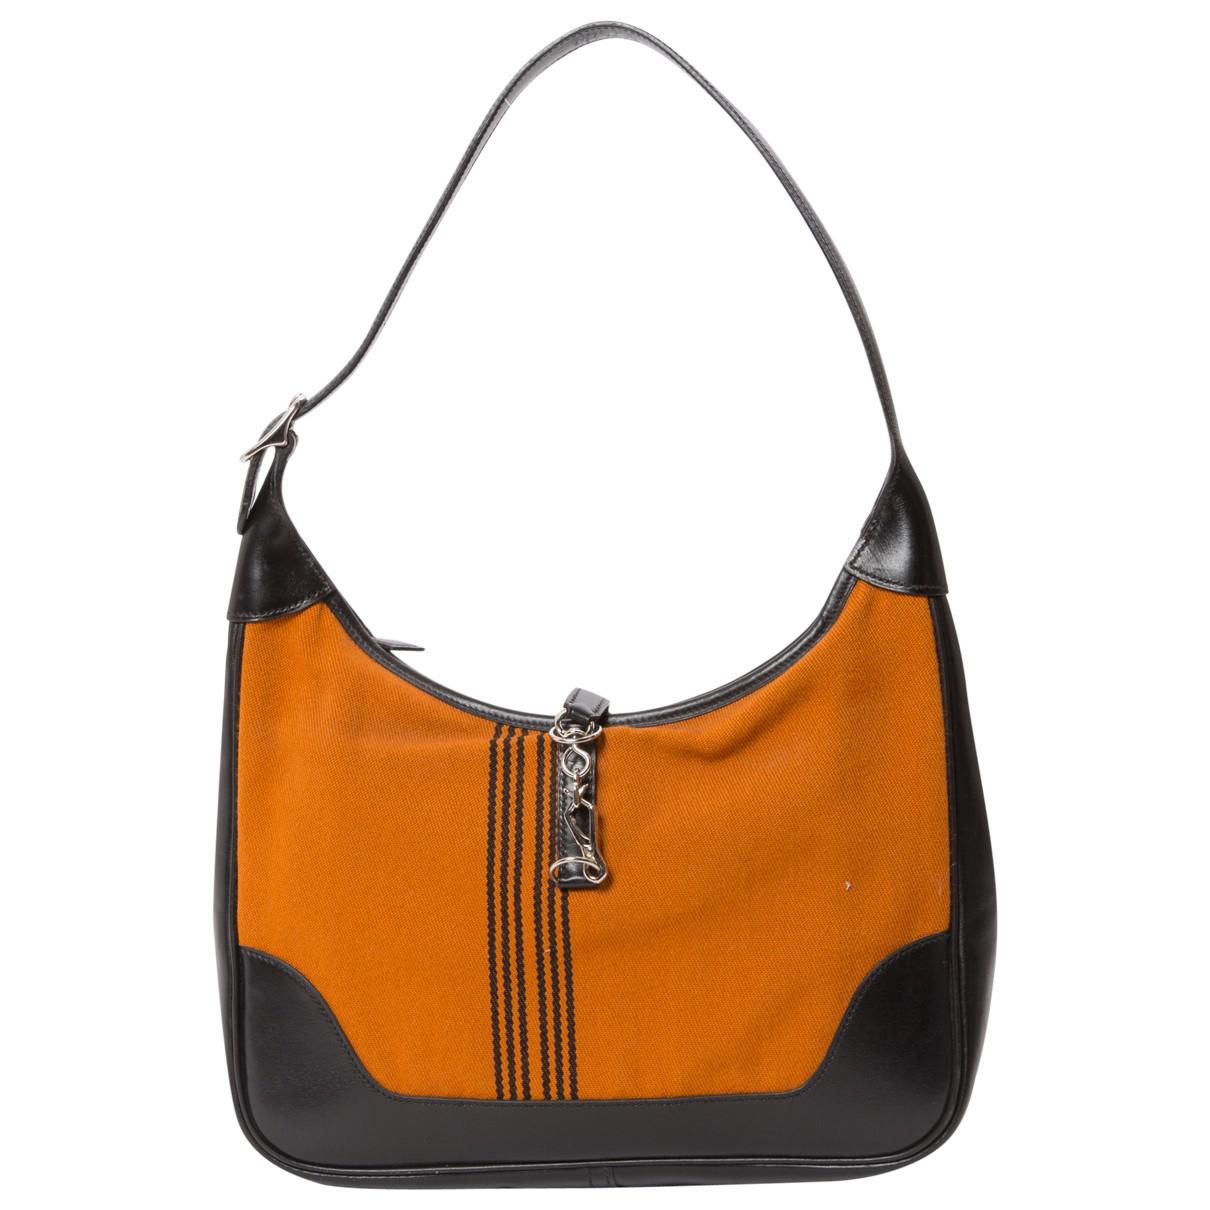 Hermès Pre-owned - Trim cloth handbag 0NCrb